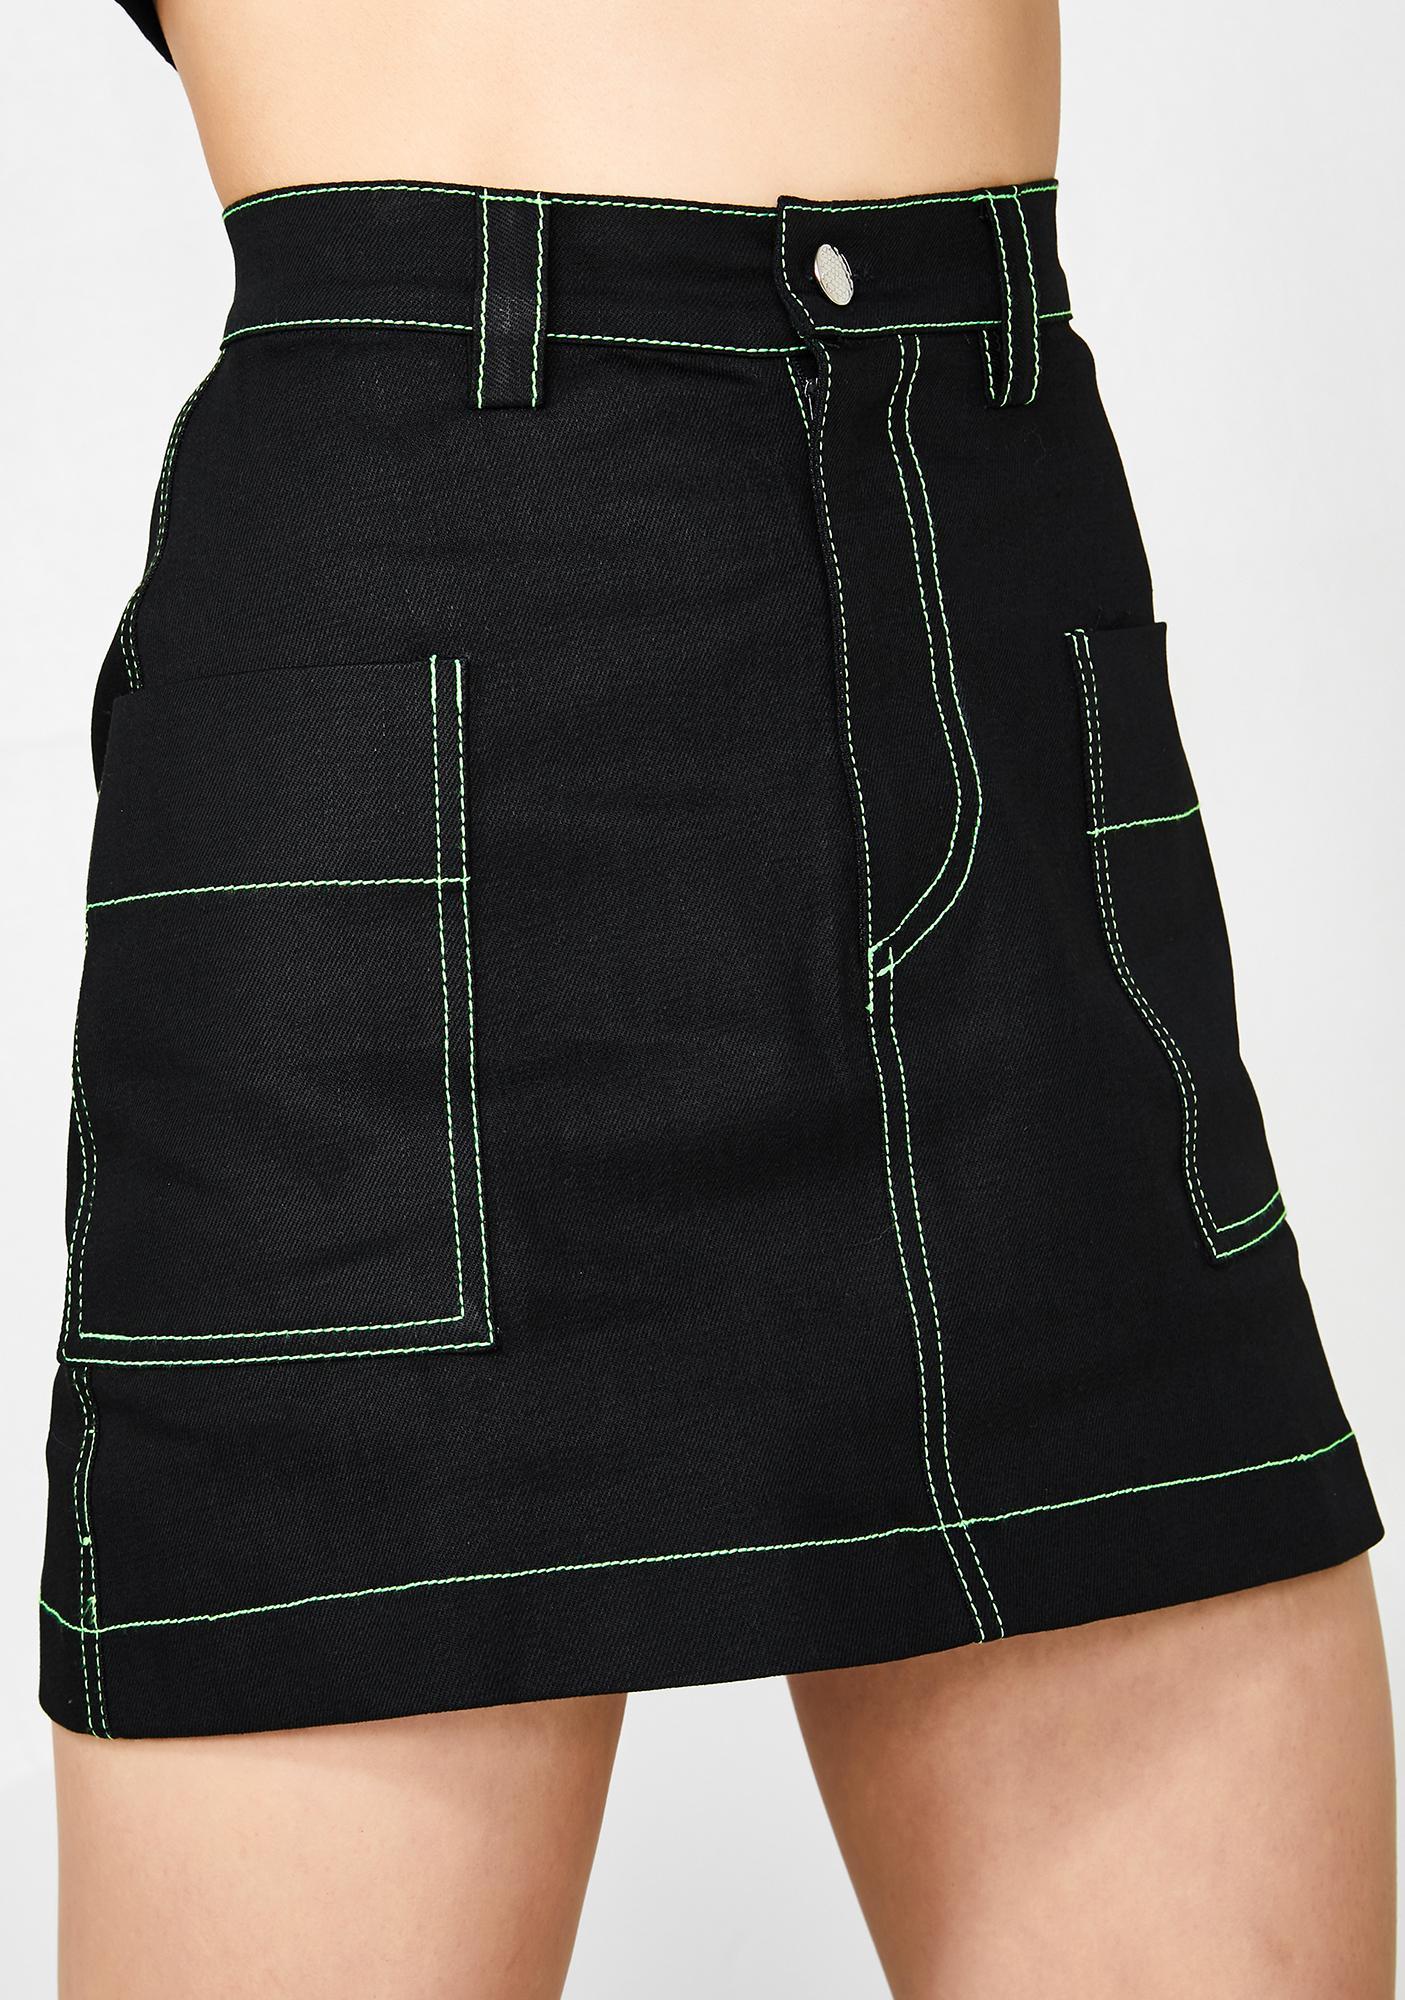 Minga Neon Stitch Utility Skirt